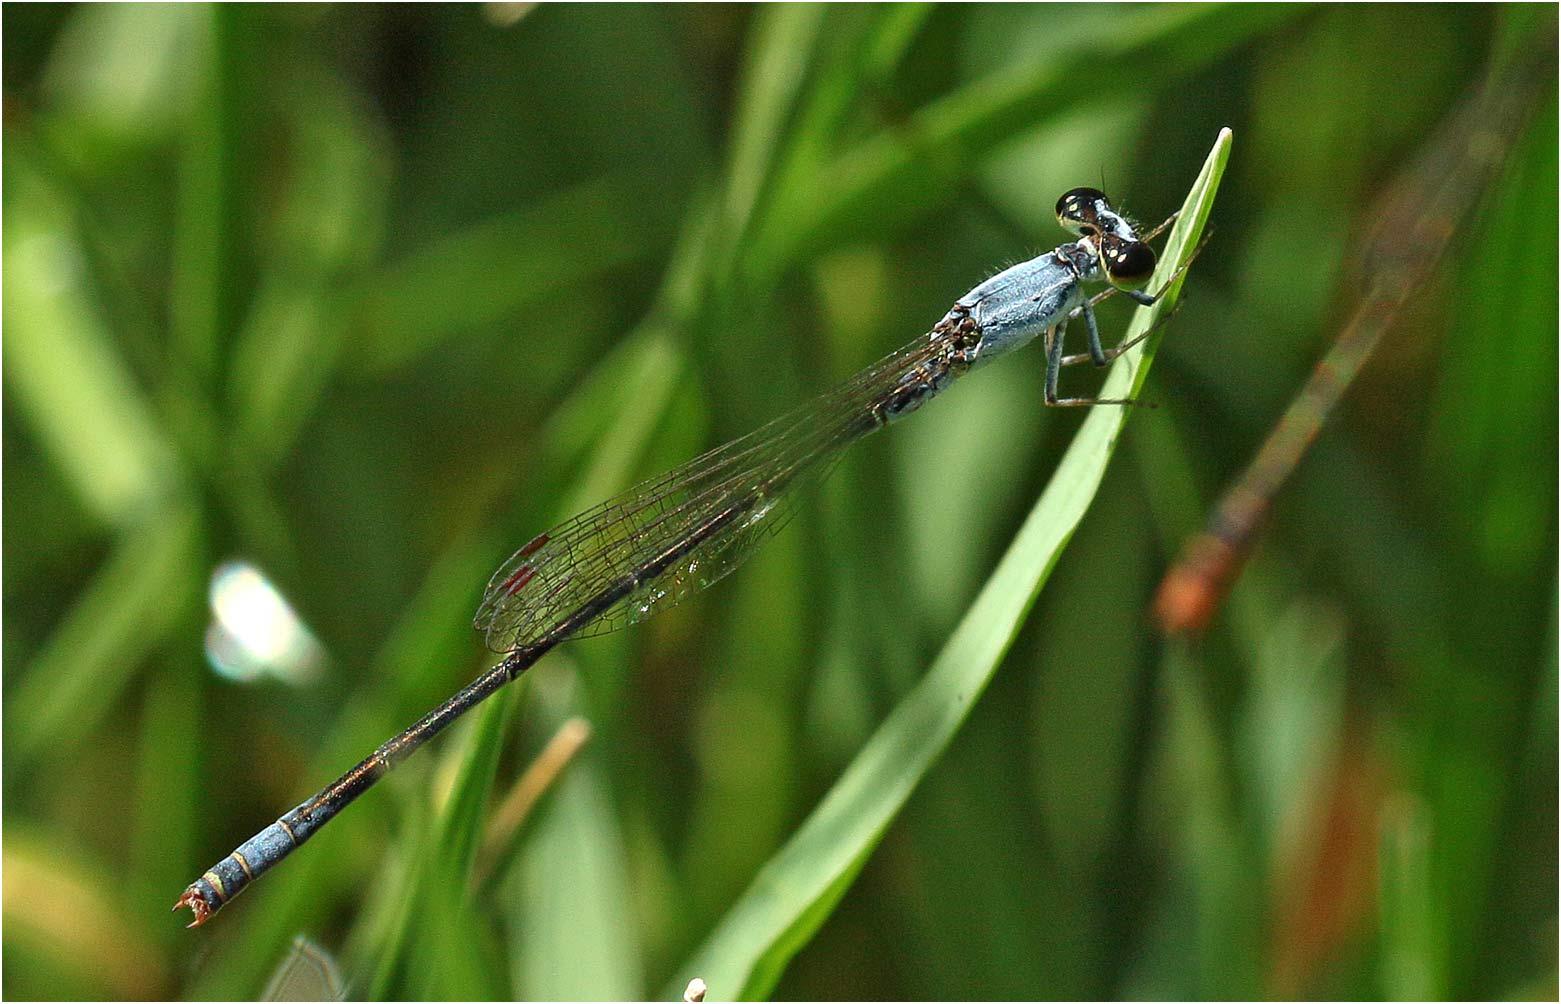 Agriocnemis inversa mâle, Ethiopie, lac Awasa, 31/10/2018